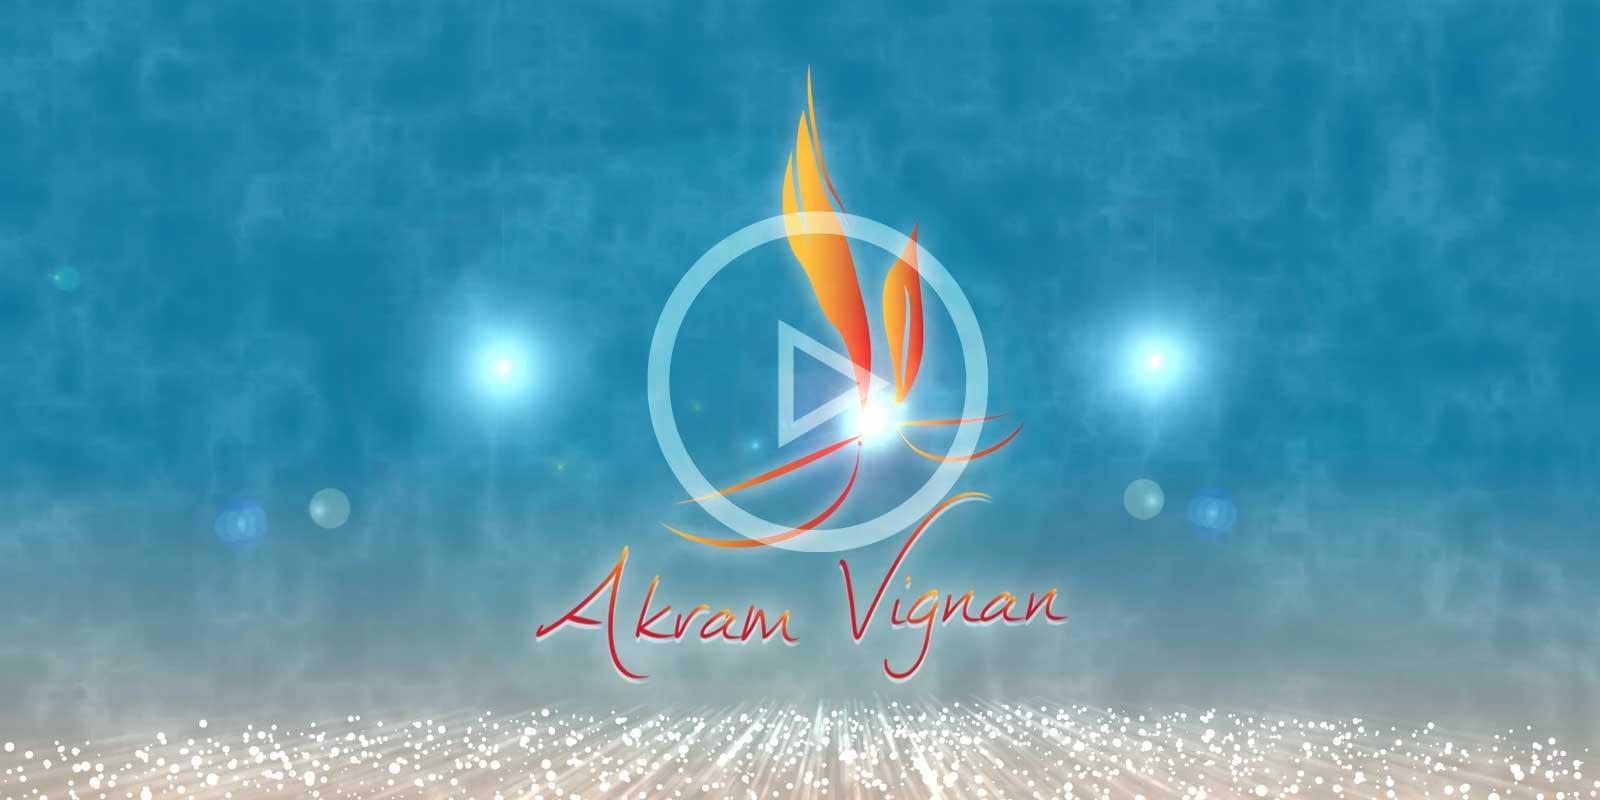 web-xplosion-videoproduktion-akram-vignan-2020